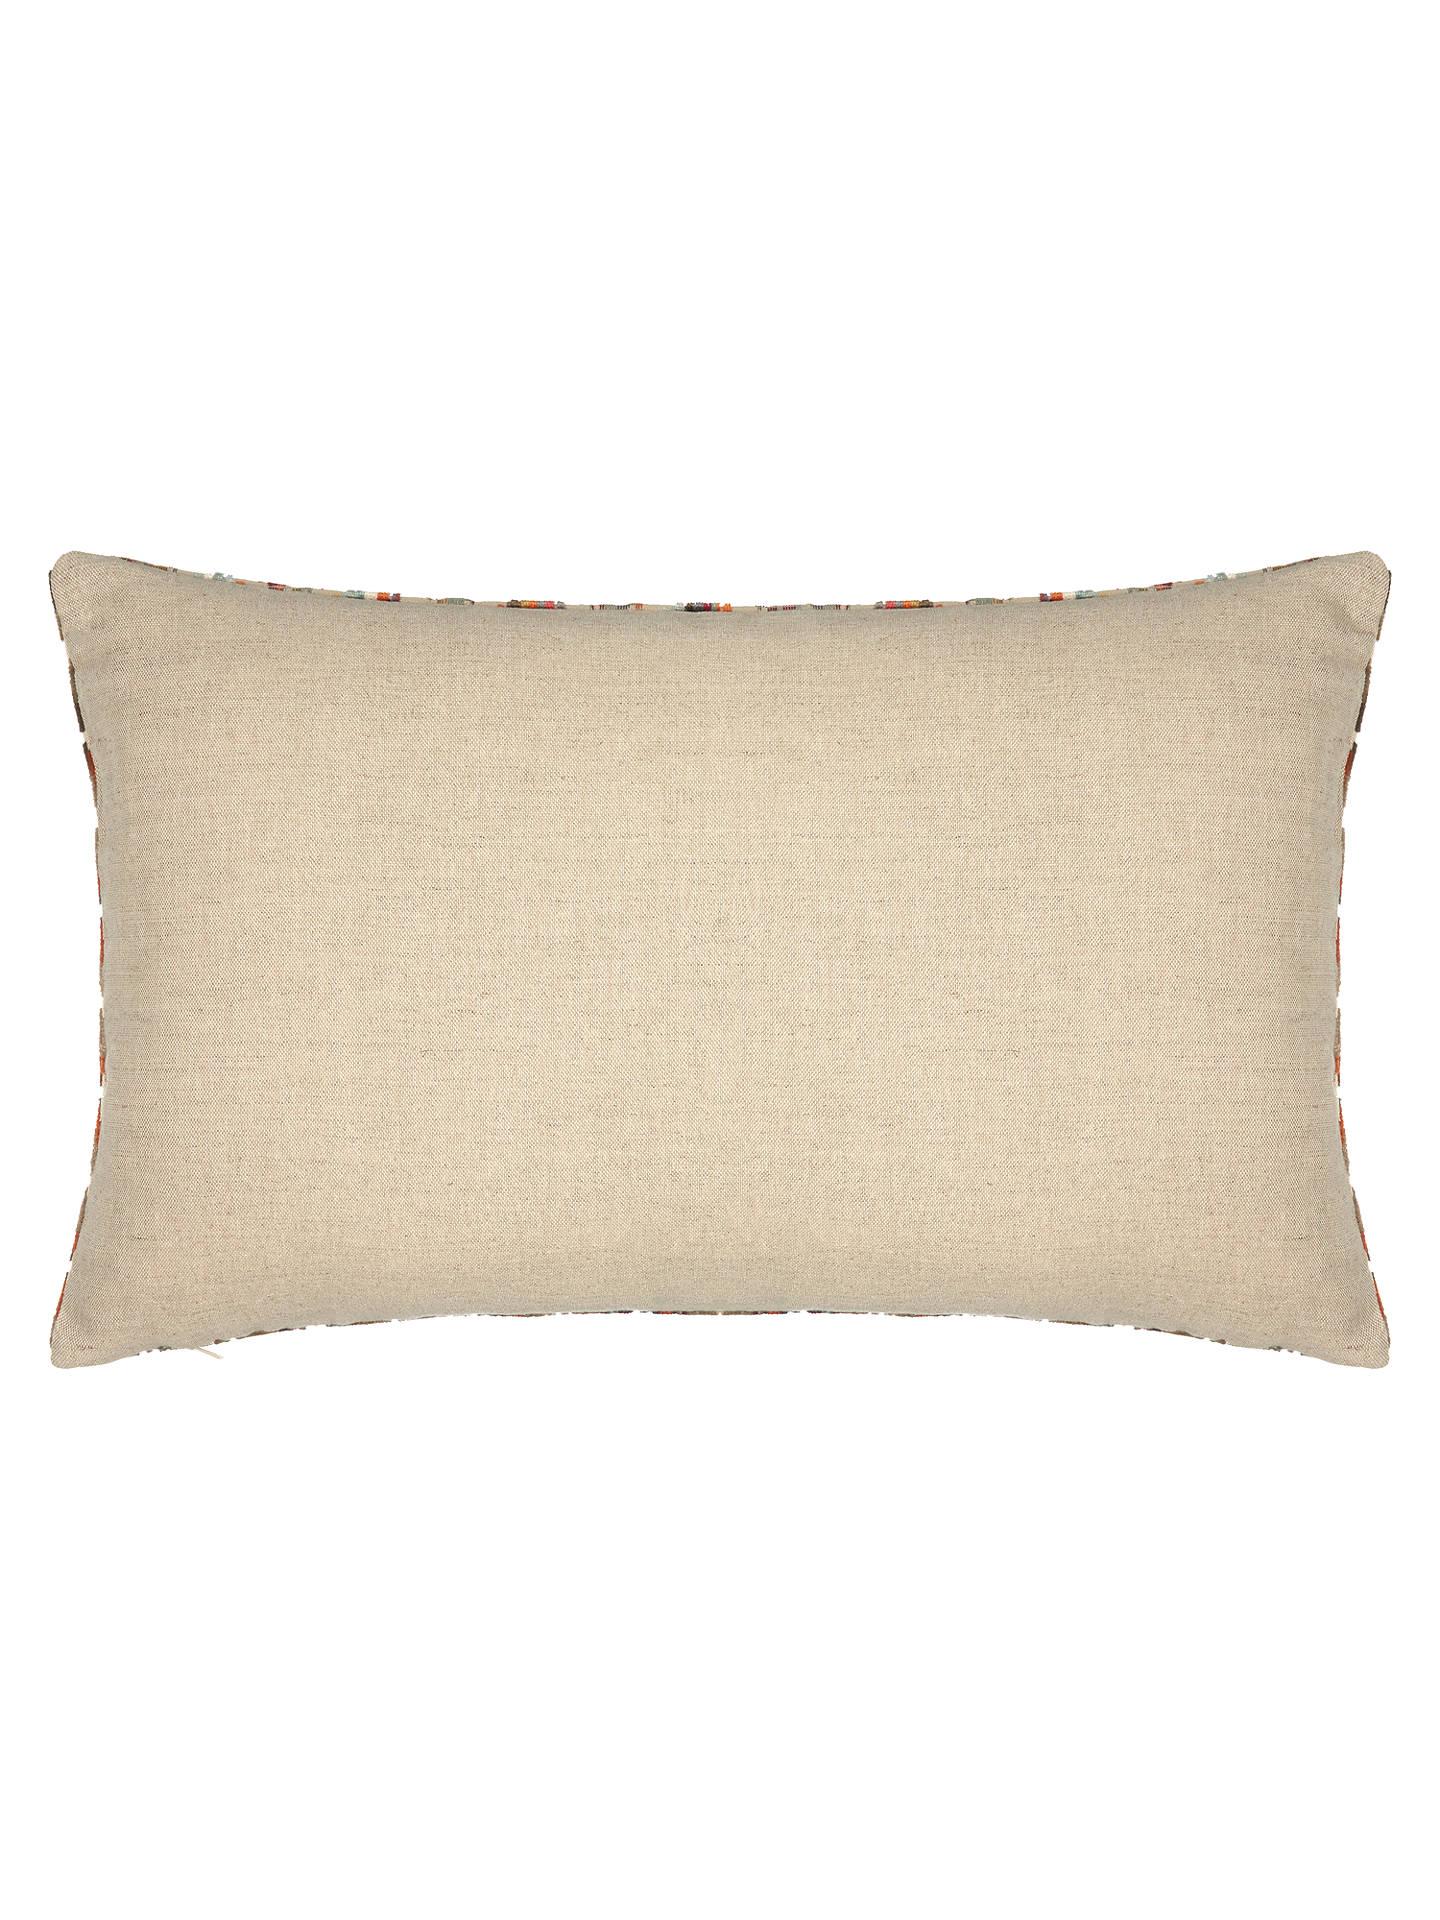 john lewis aava diamonds cushion multi at john lewis. Black Bedroom Furniture Sets. Home Design Ideas